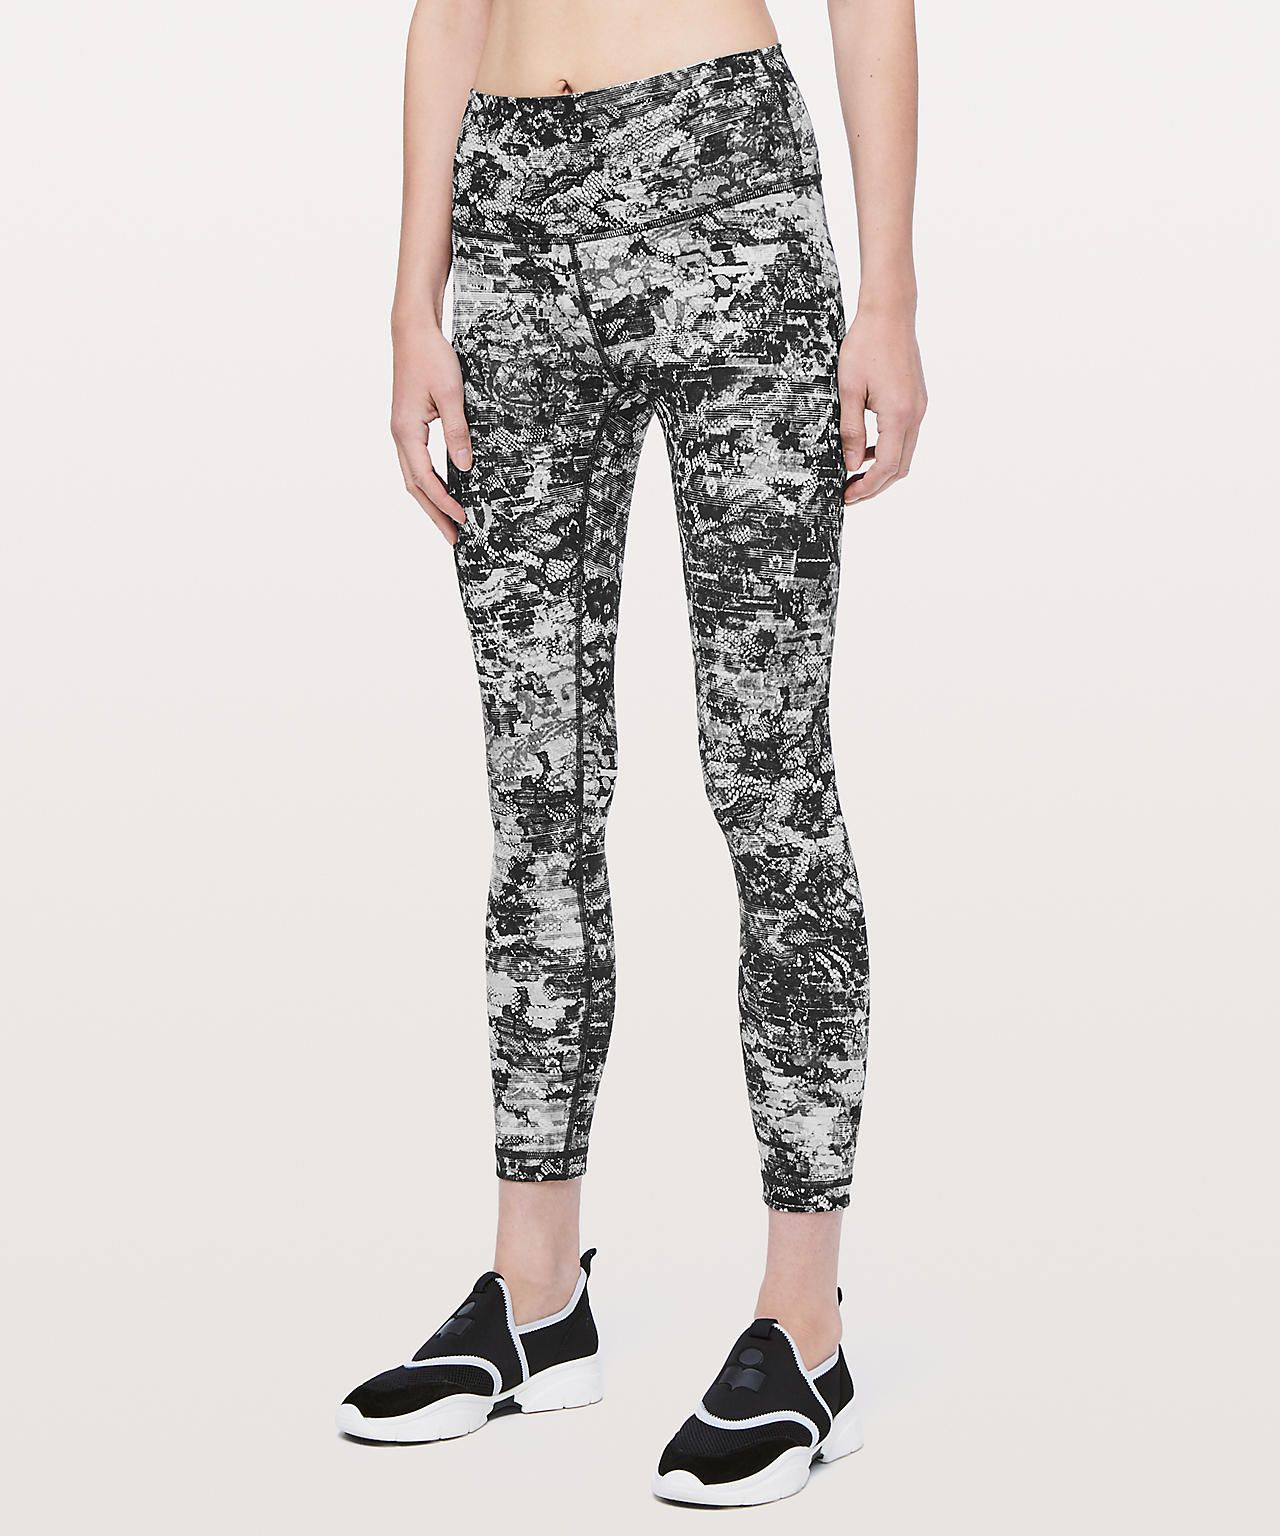 381e859911e61 Lululemon leggings (size 6) preferably in a dark colour (pattern or no  pattern), 7/8 or full length